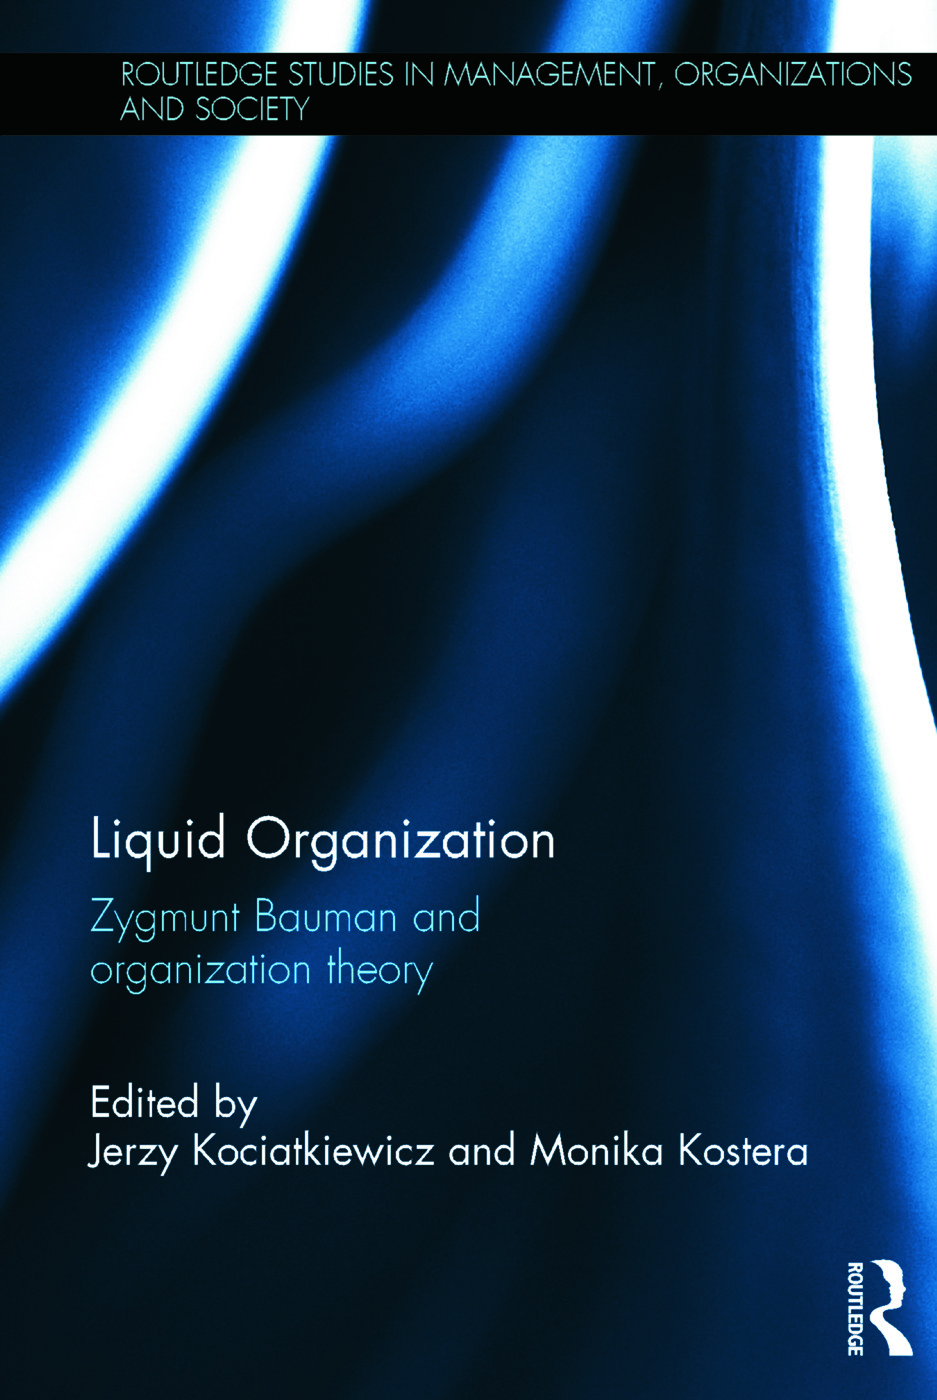 Liquid Organization: Zygmunt Bauman and Organization Theory book cover